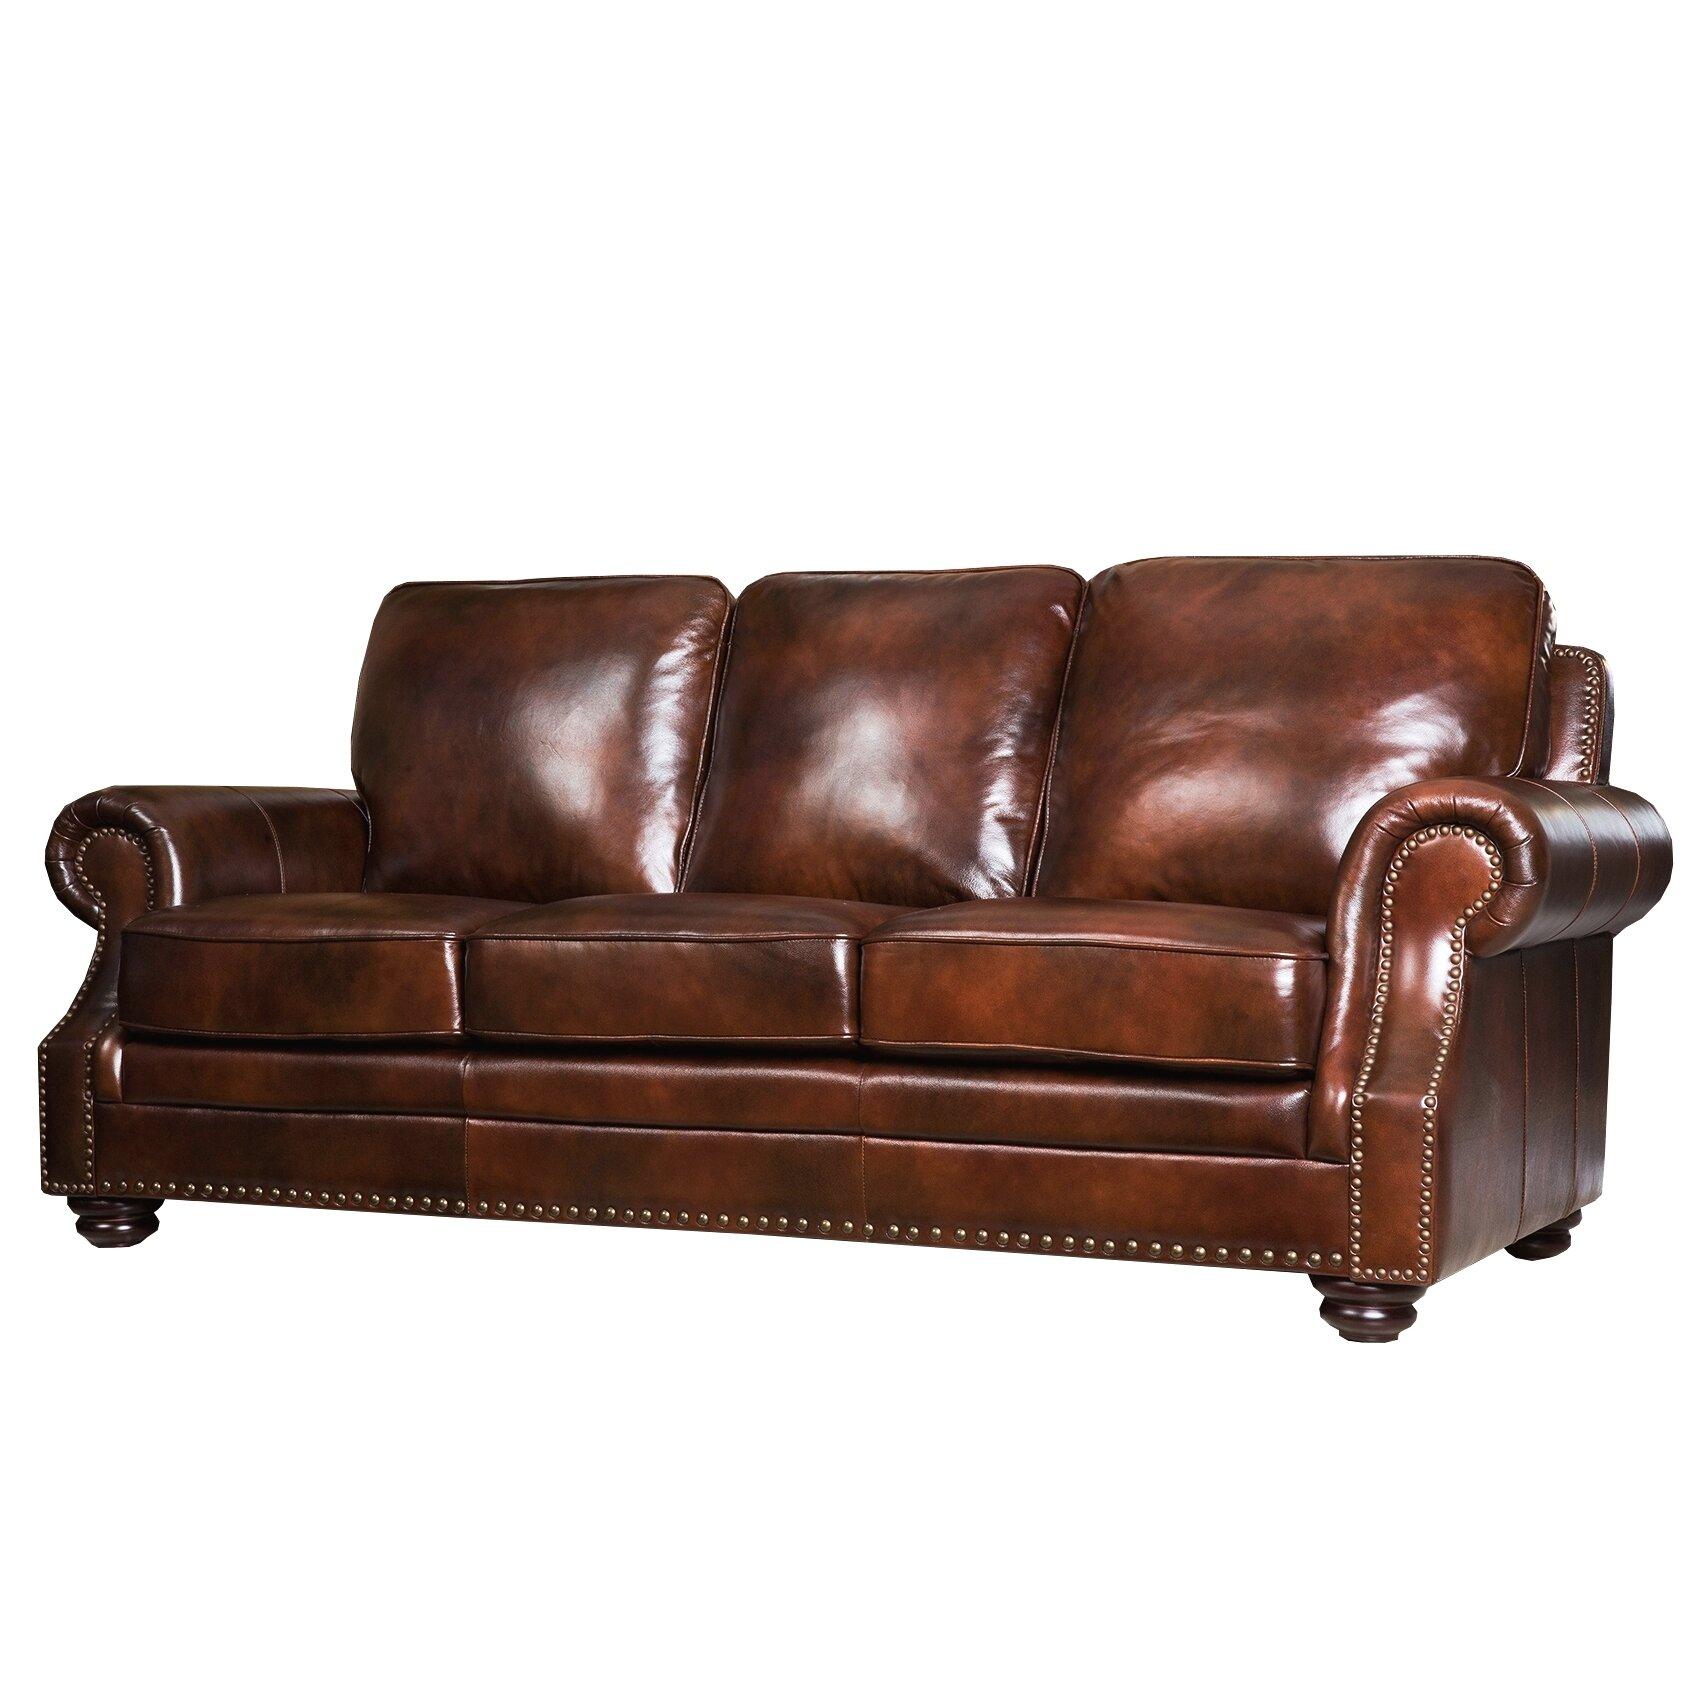 Reviews For Leather Sofas: Abbyson Living Karington Leather Sofa & Reviews